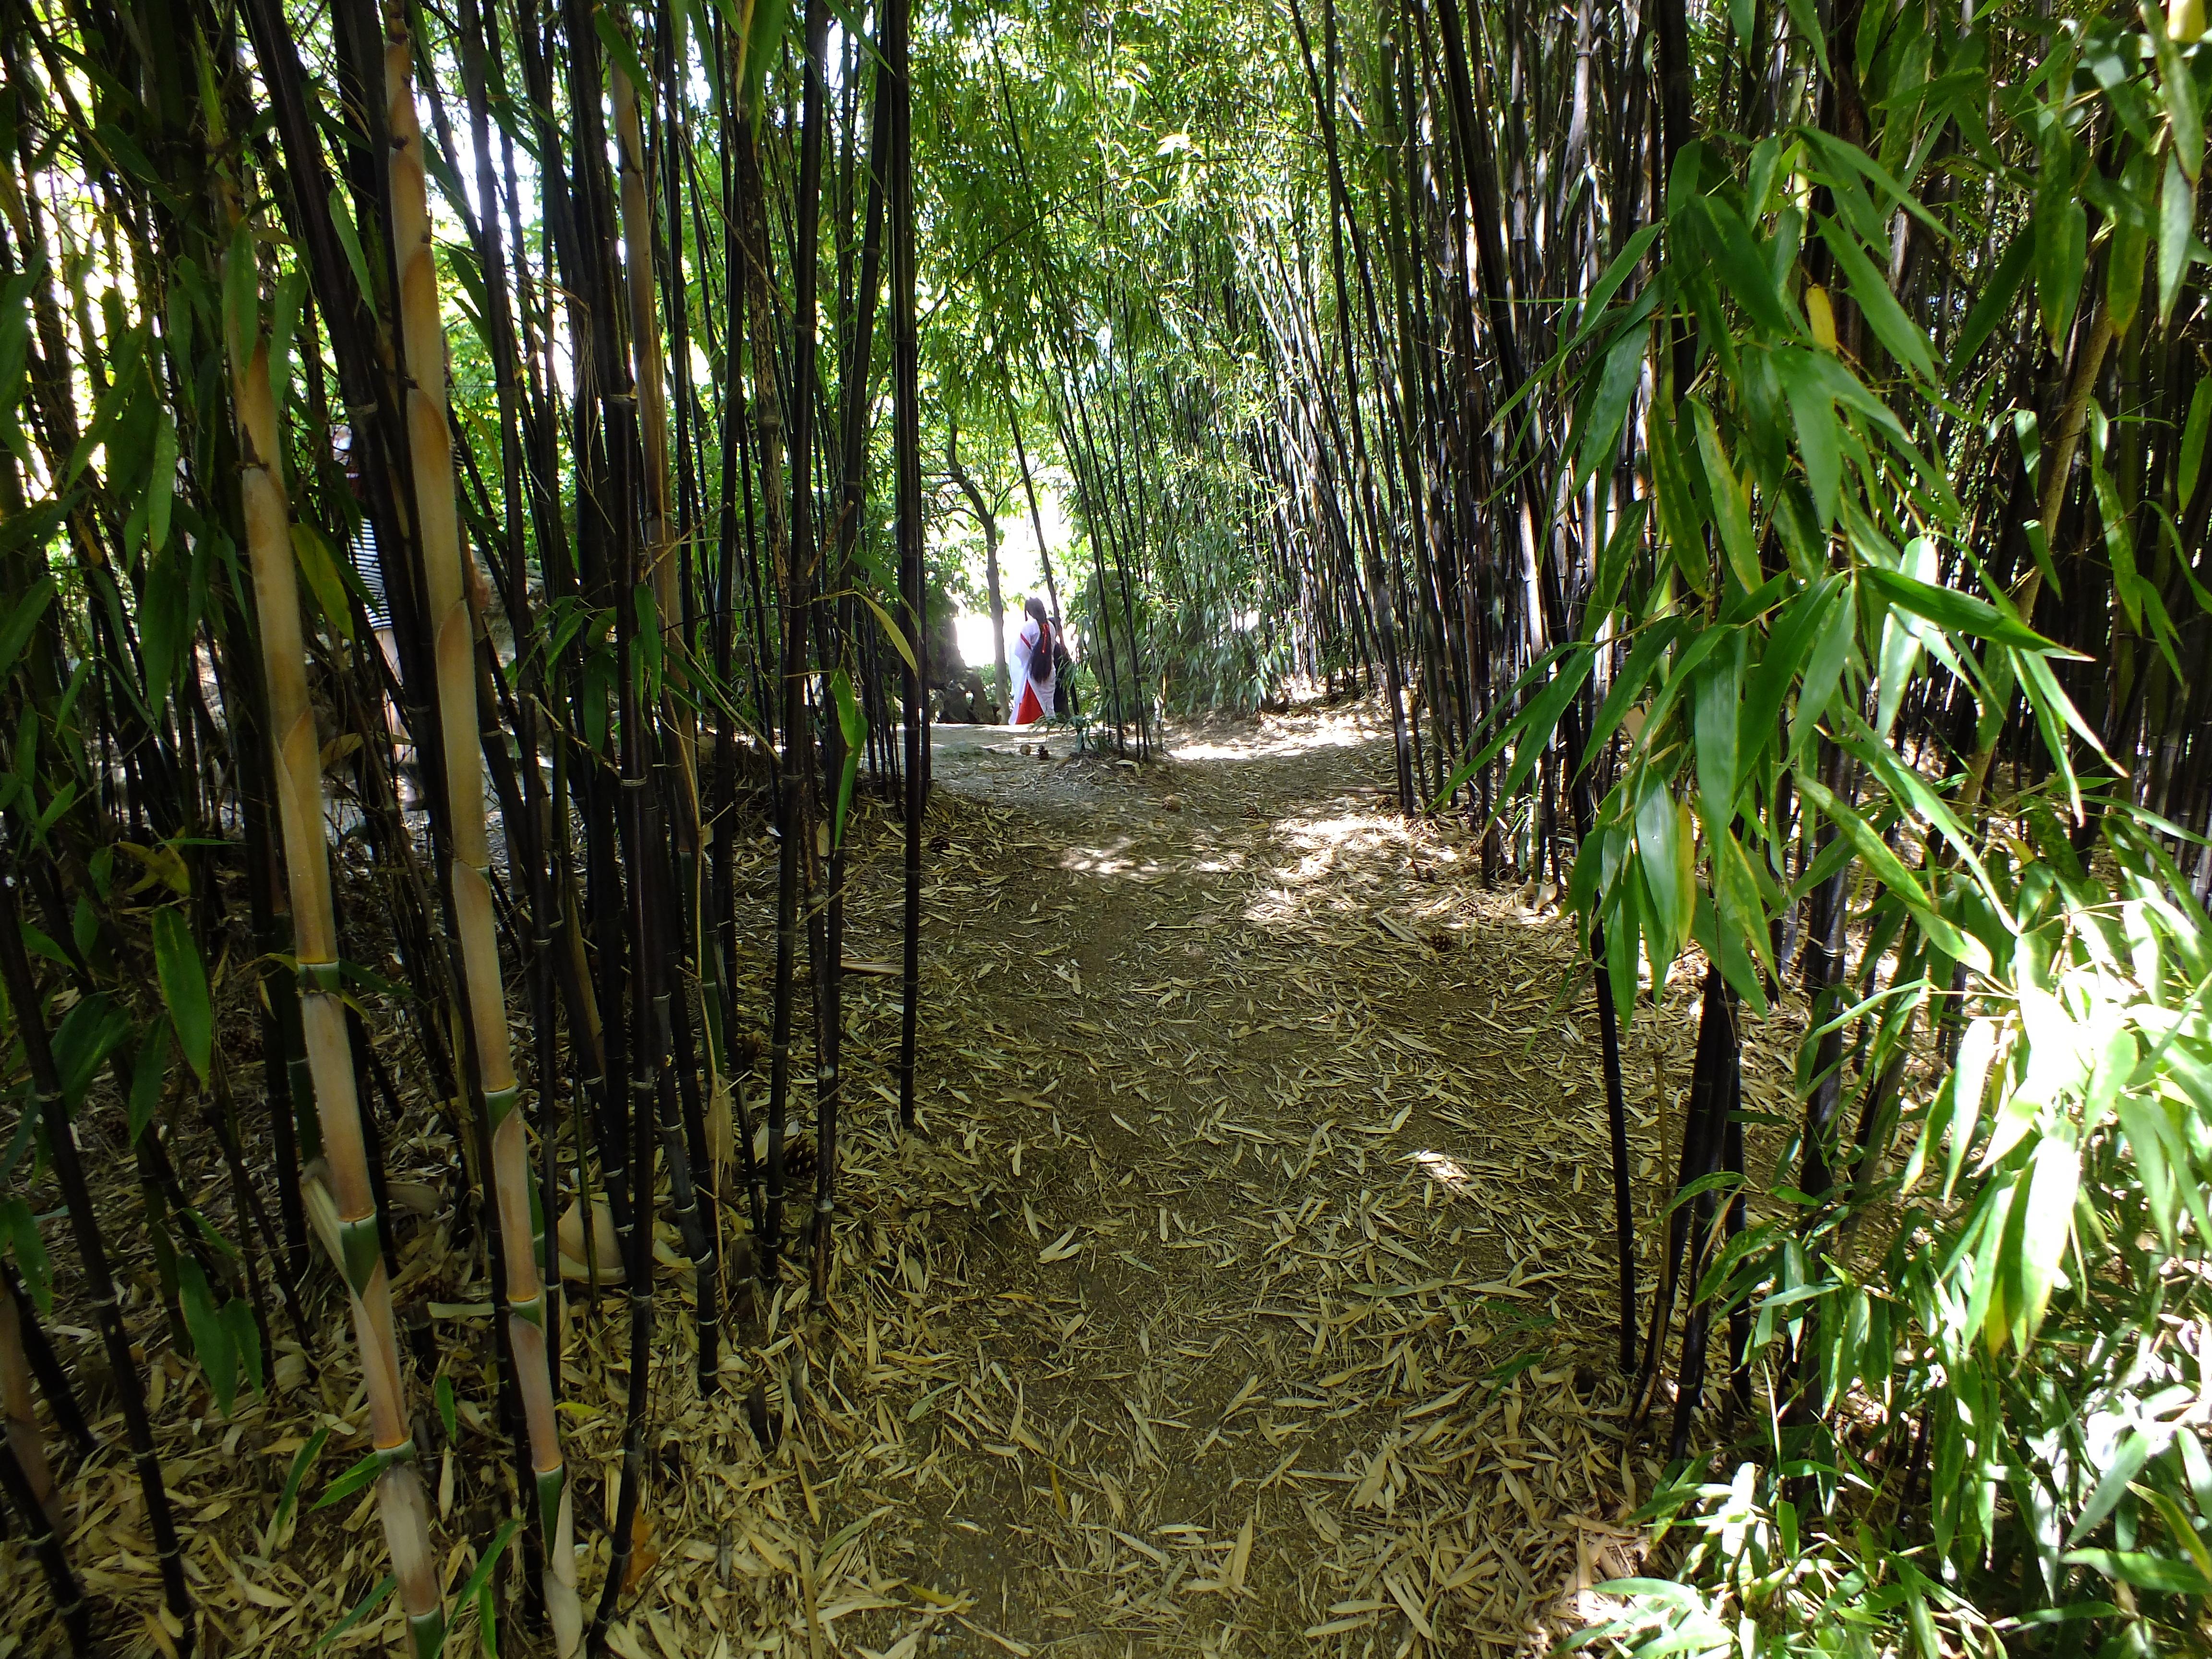 bamboo | U.S. Japanese Gardens